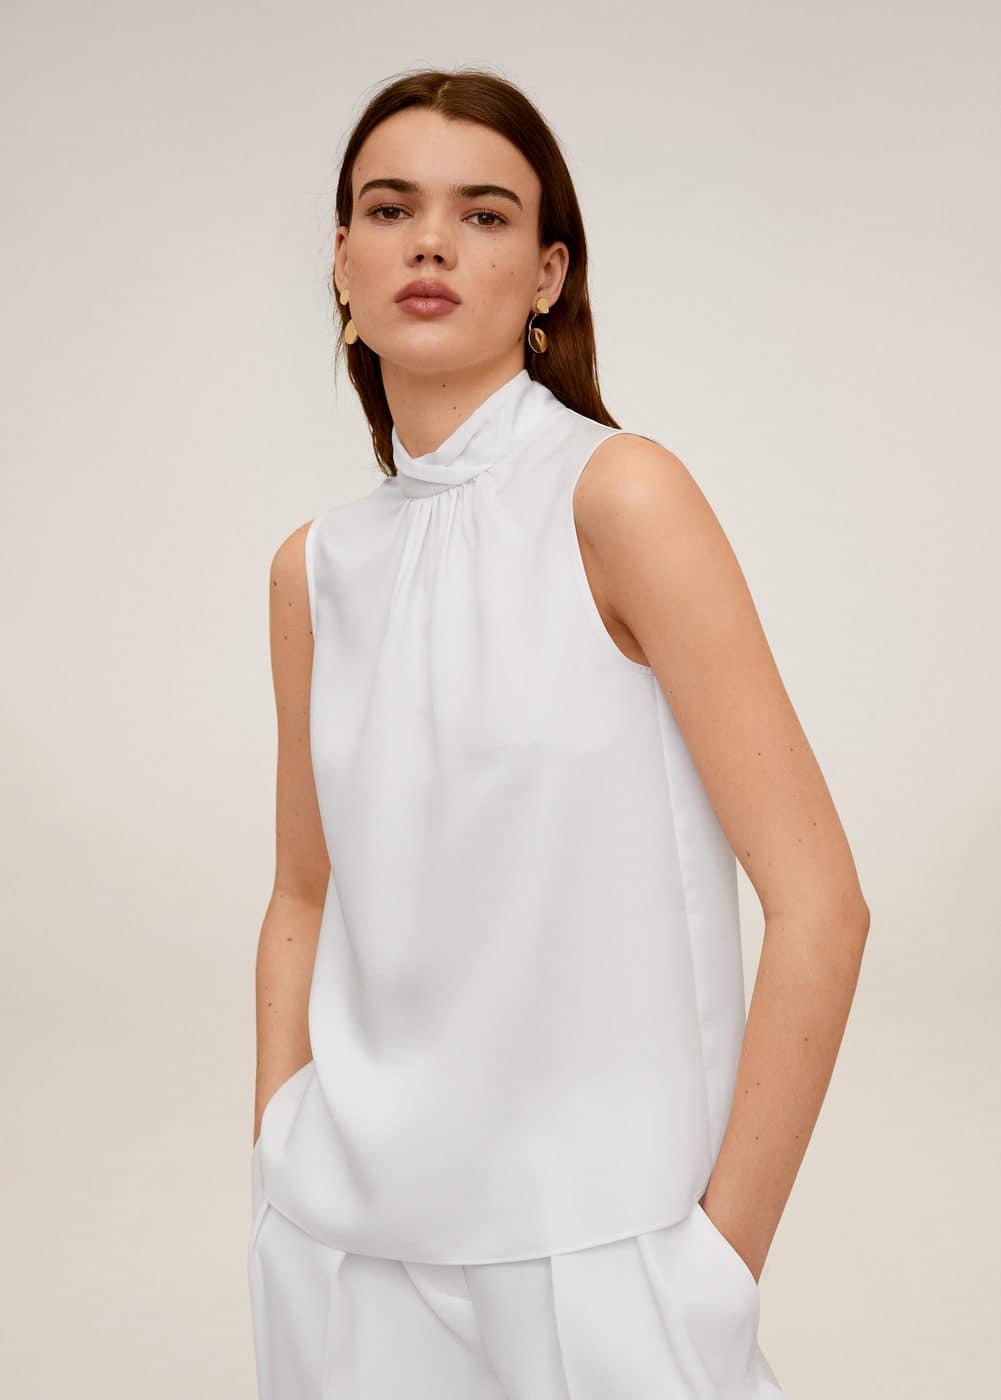 m-empire6:blusa detalle pliegues